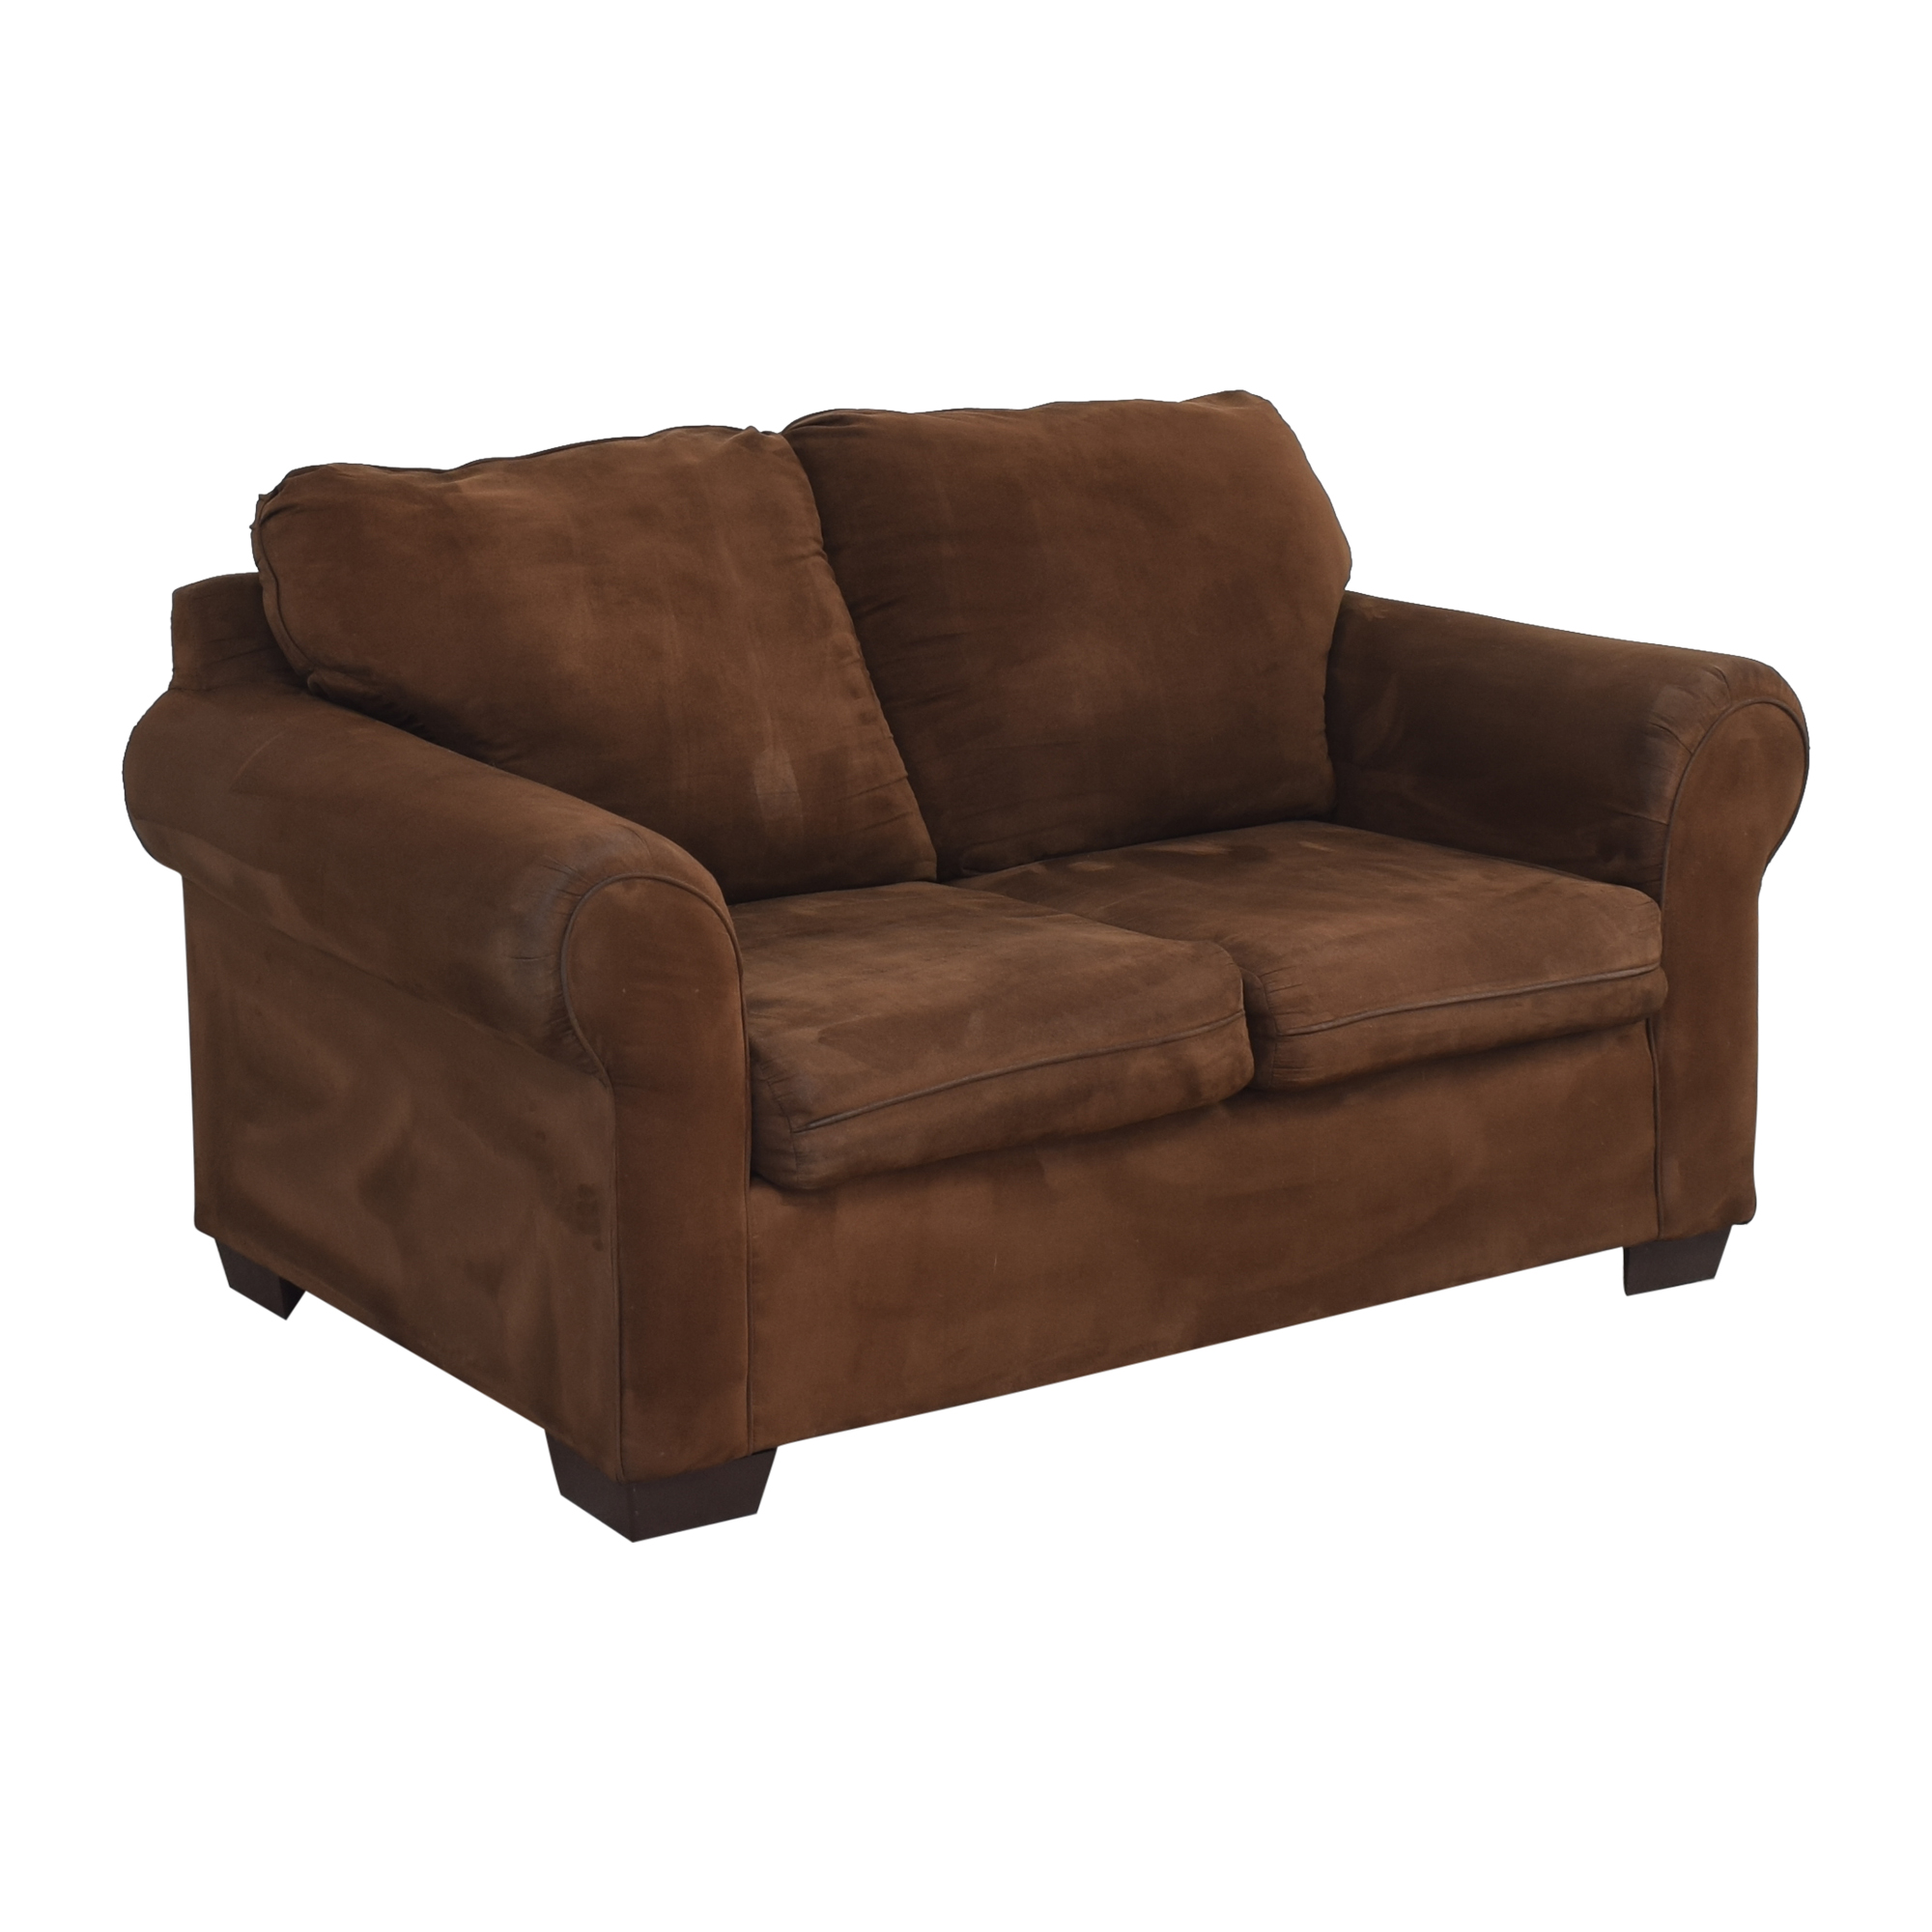 United Furniture United Furniture Roll Arm Loveseat for sale